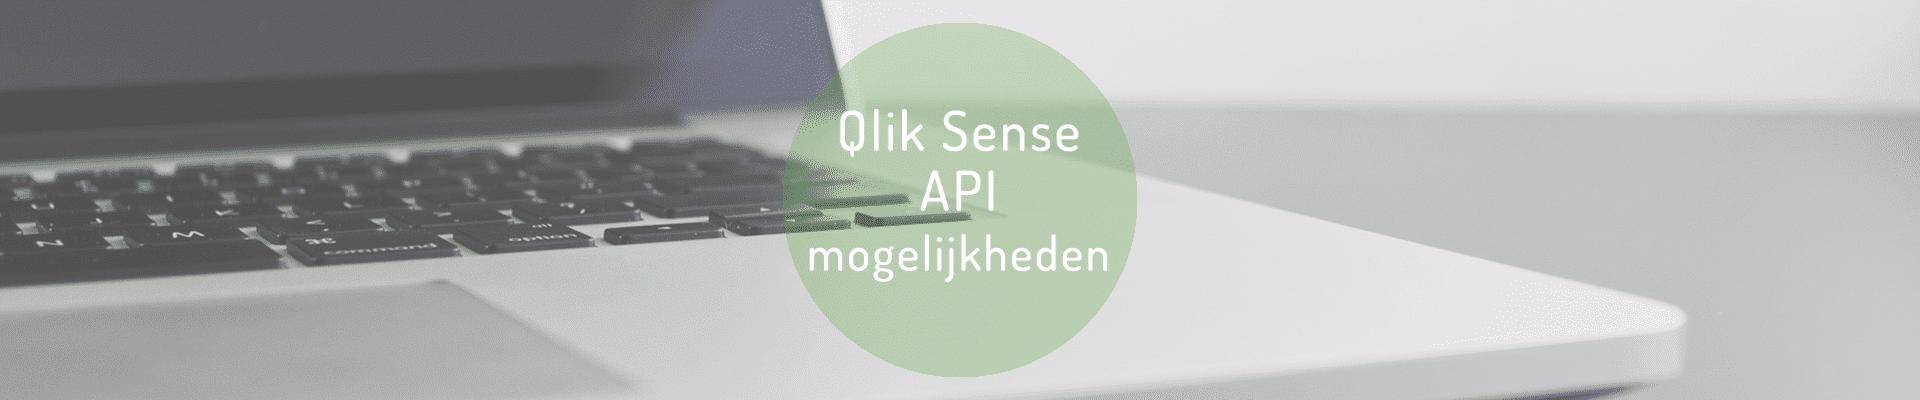 api,rss qlik,api qlik sense, qlik sense connect, qlik analytics platform